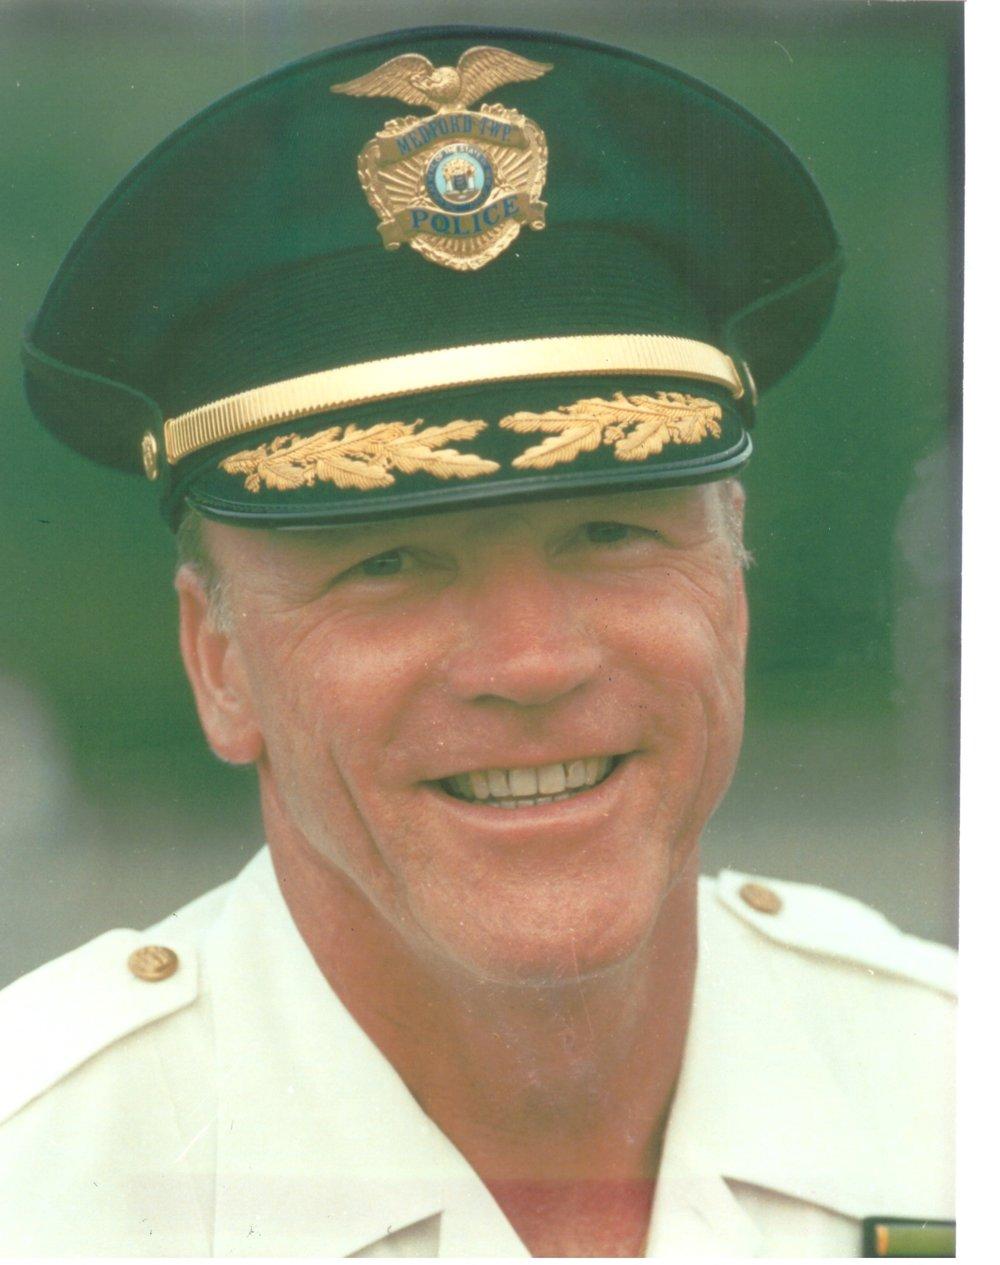 Chief Steve McGarvey #2510